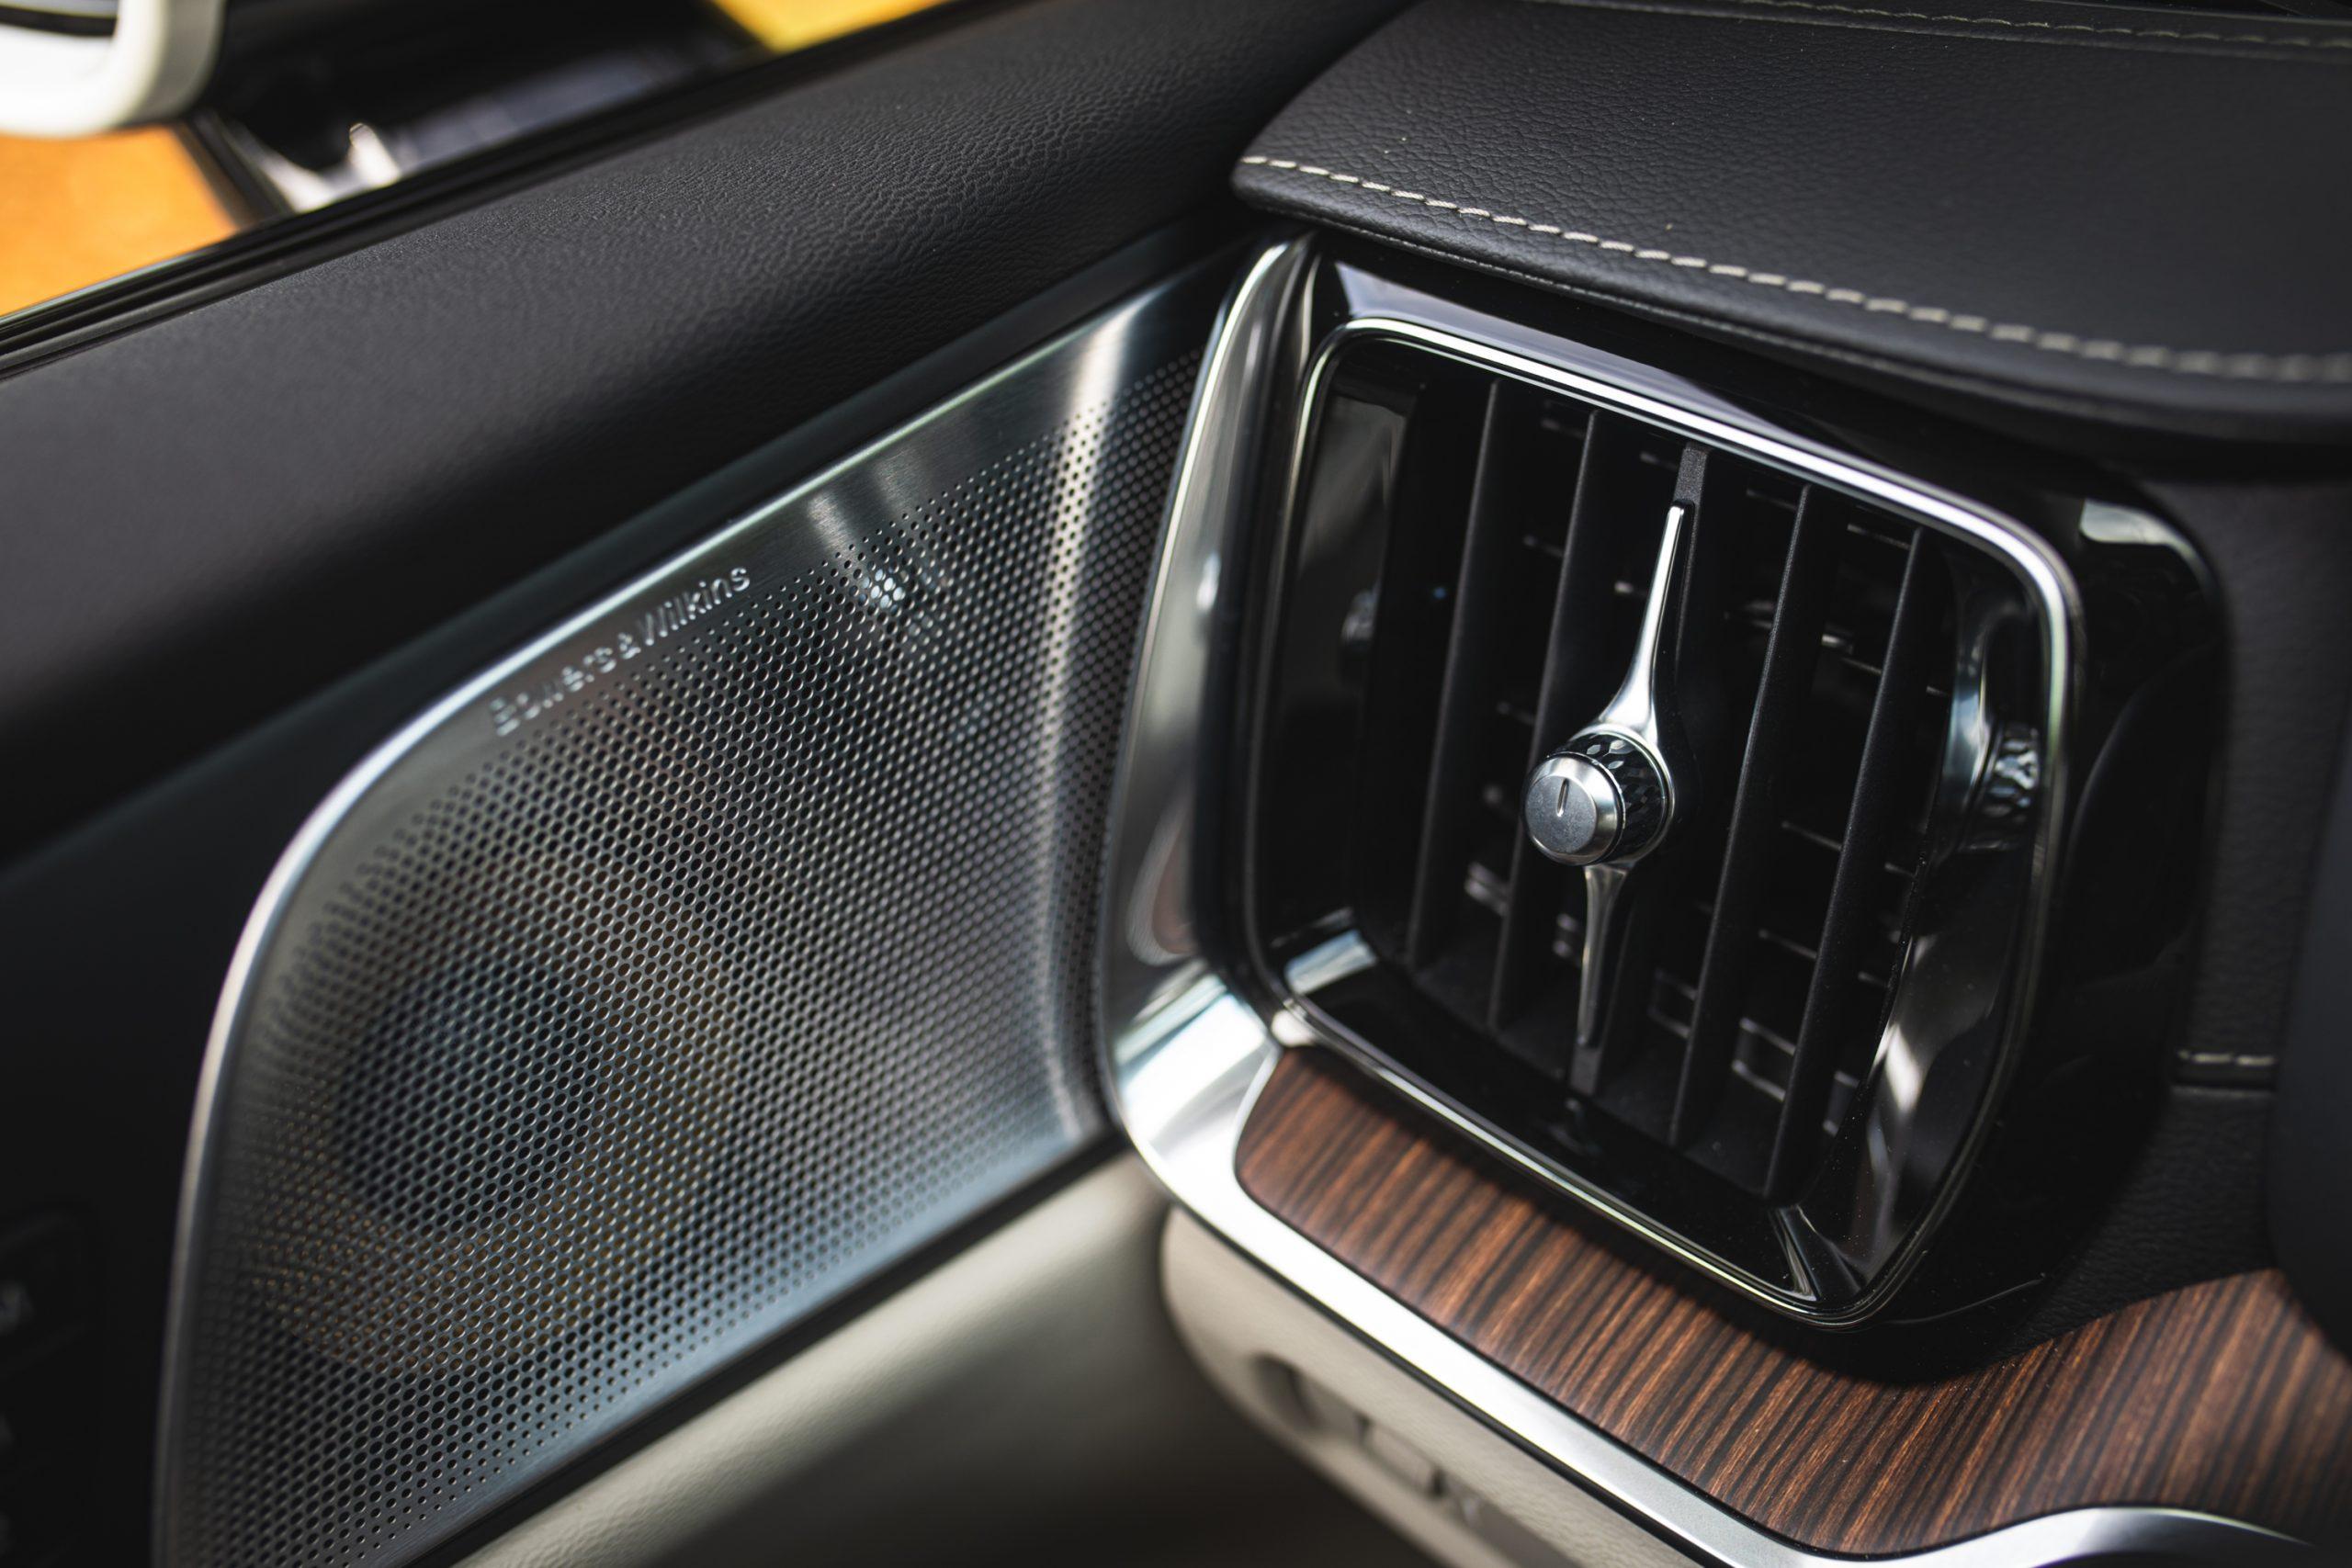 Volvo V60 Cross Country T5 AWD interior vent knob speaker